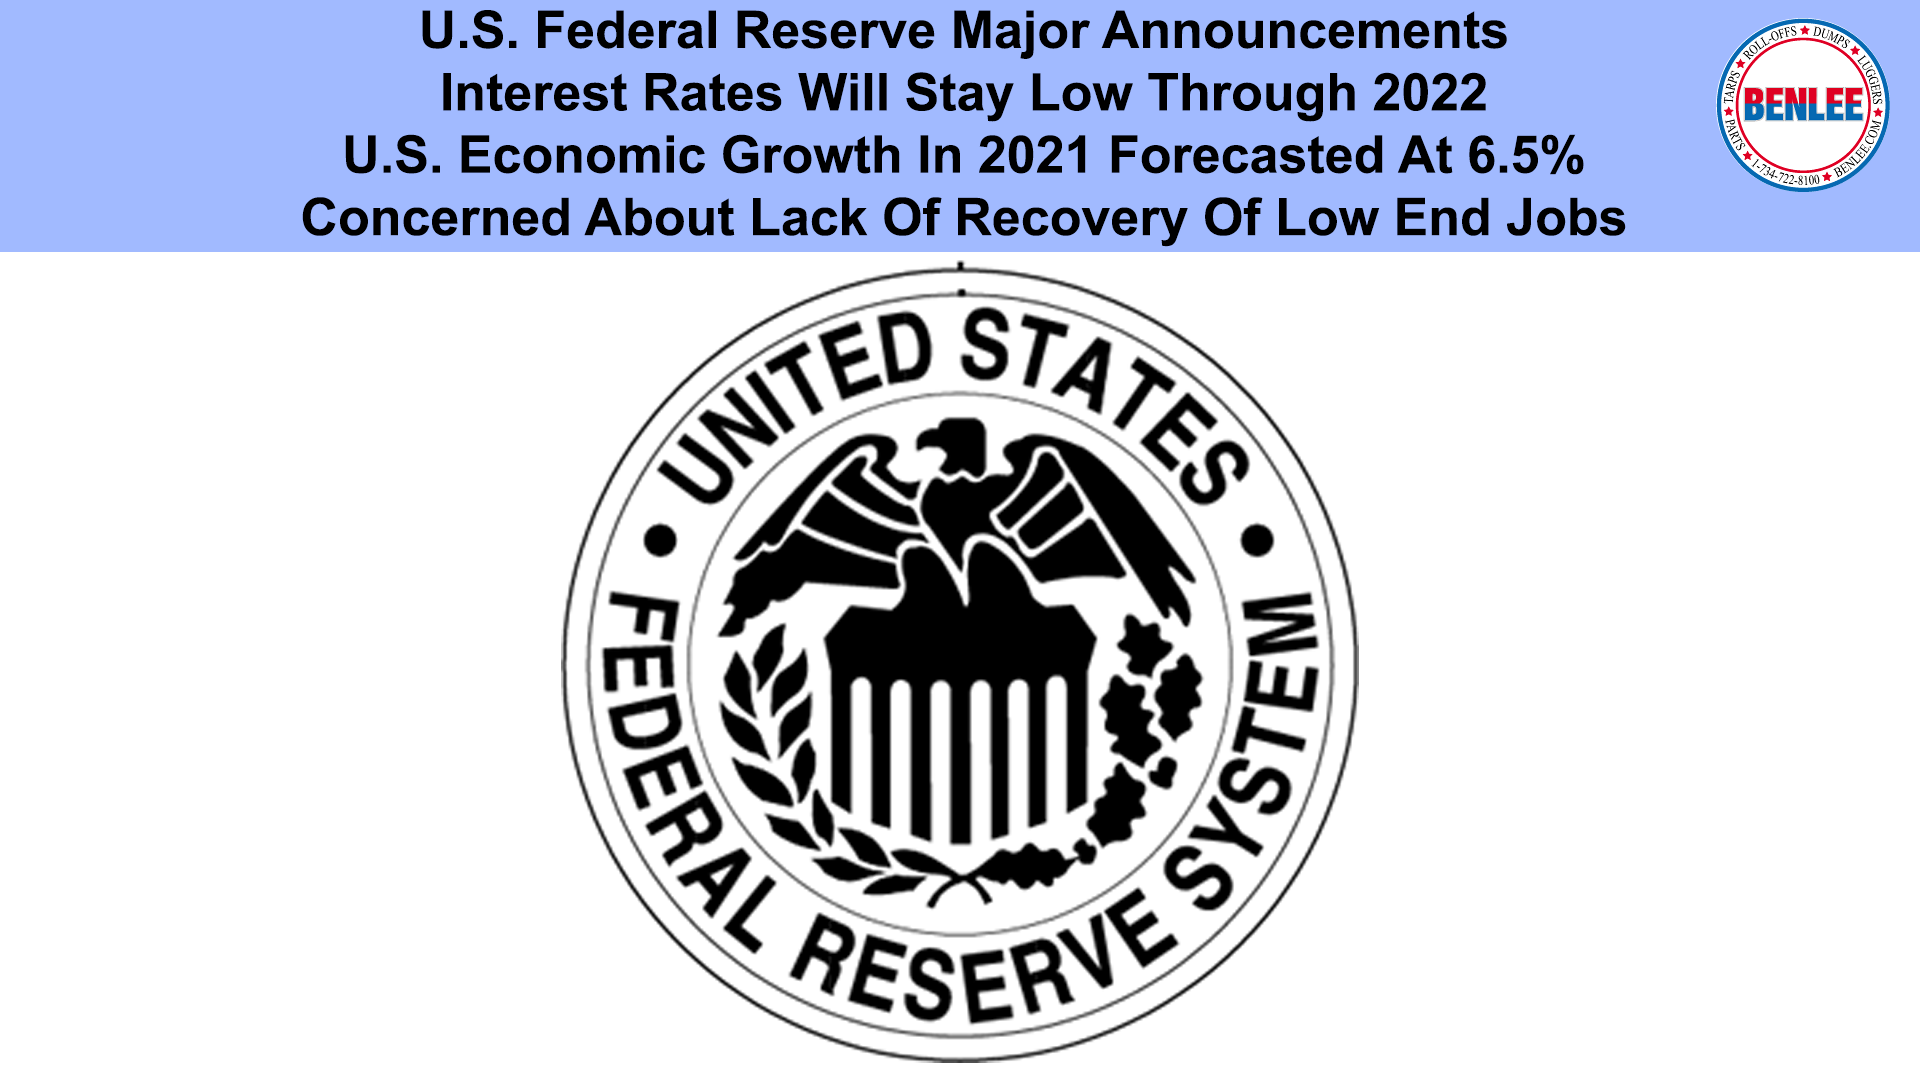 U.S. Federal Reserve Major Announcements